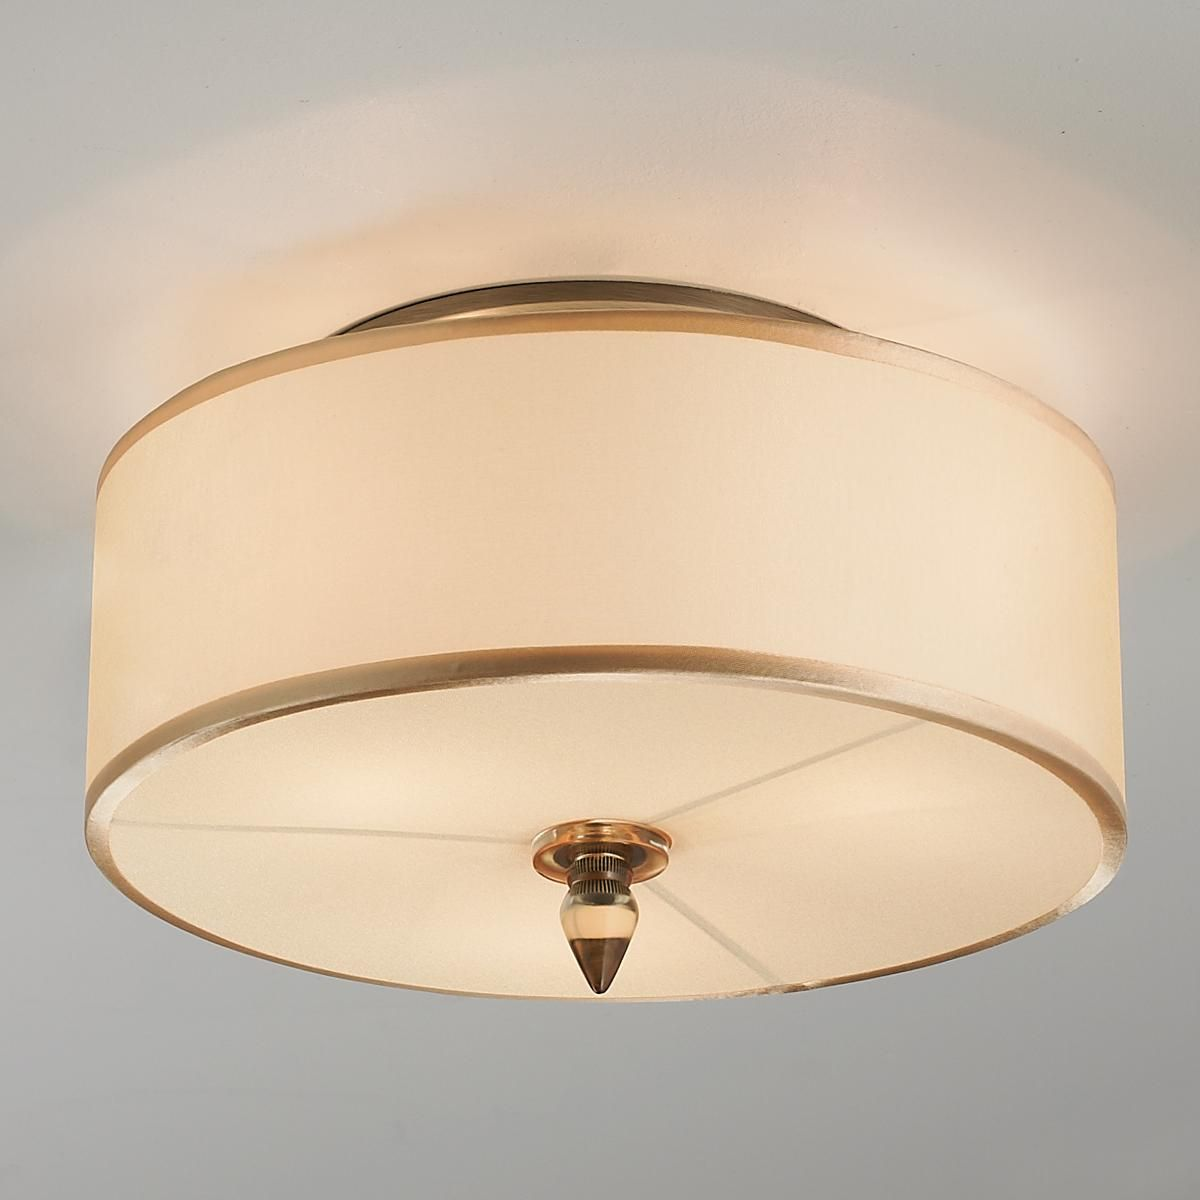 contemporary drum lighting. Contemporary Drum Lighting. Crystal Drop Ceiling Light Lighting G